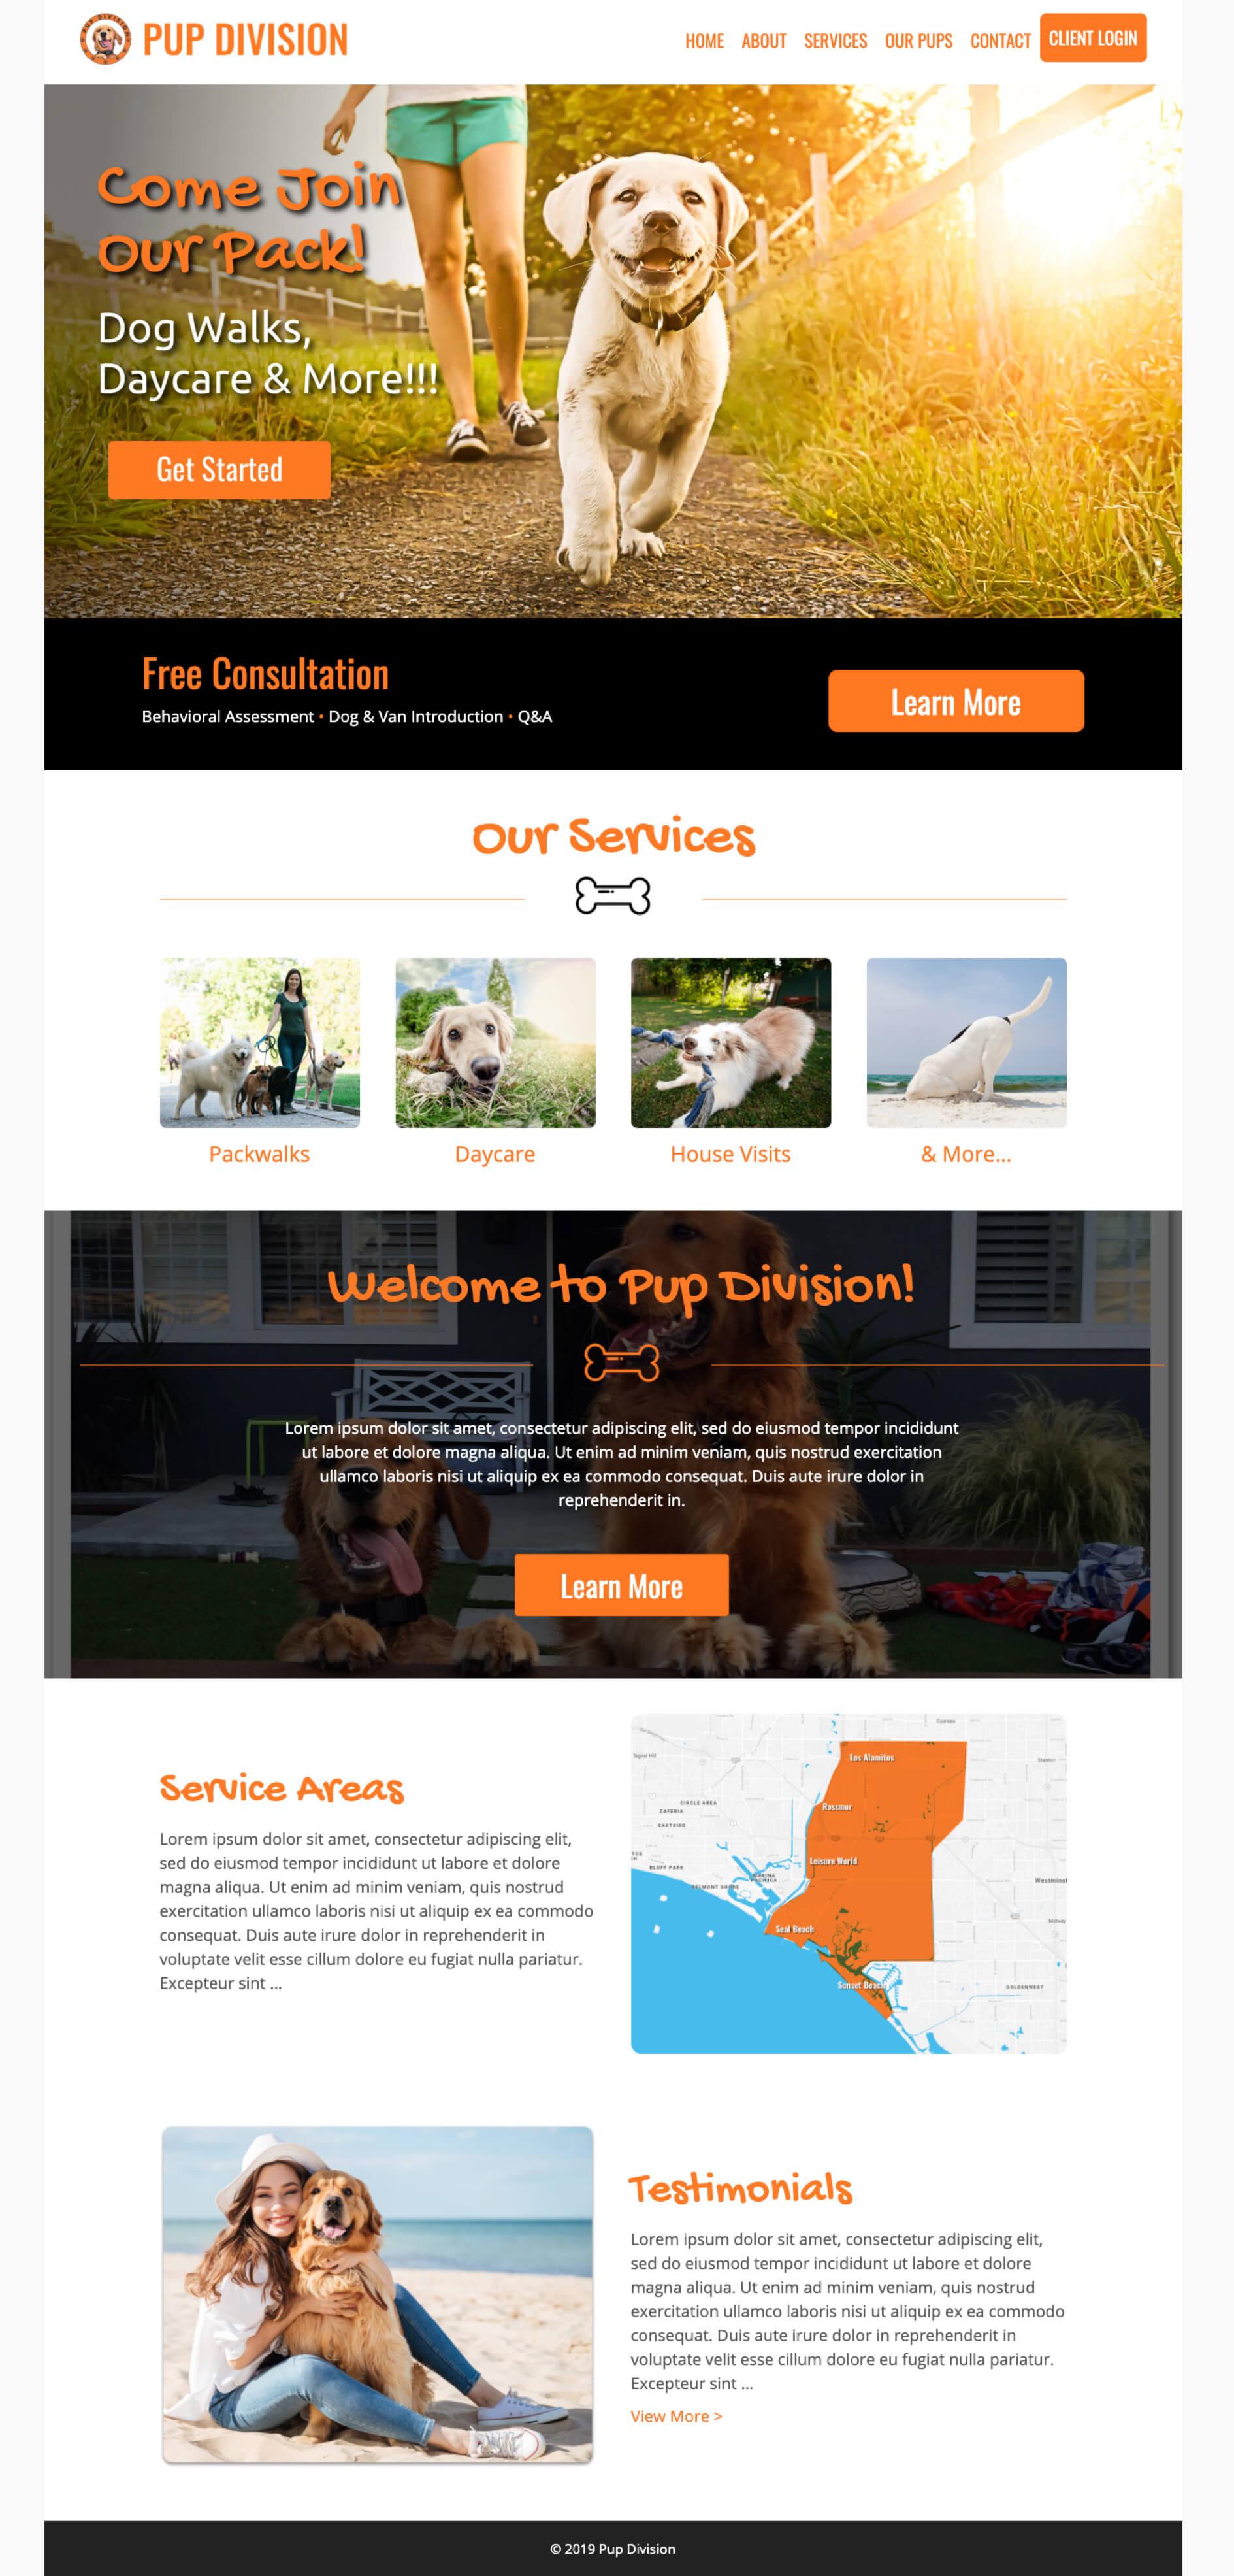 Pup-Division-Orange-County-Dog-Walking-Service